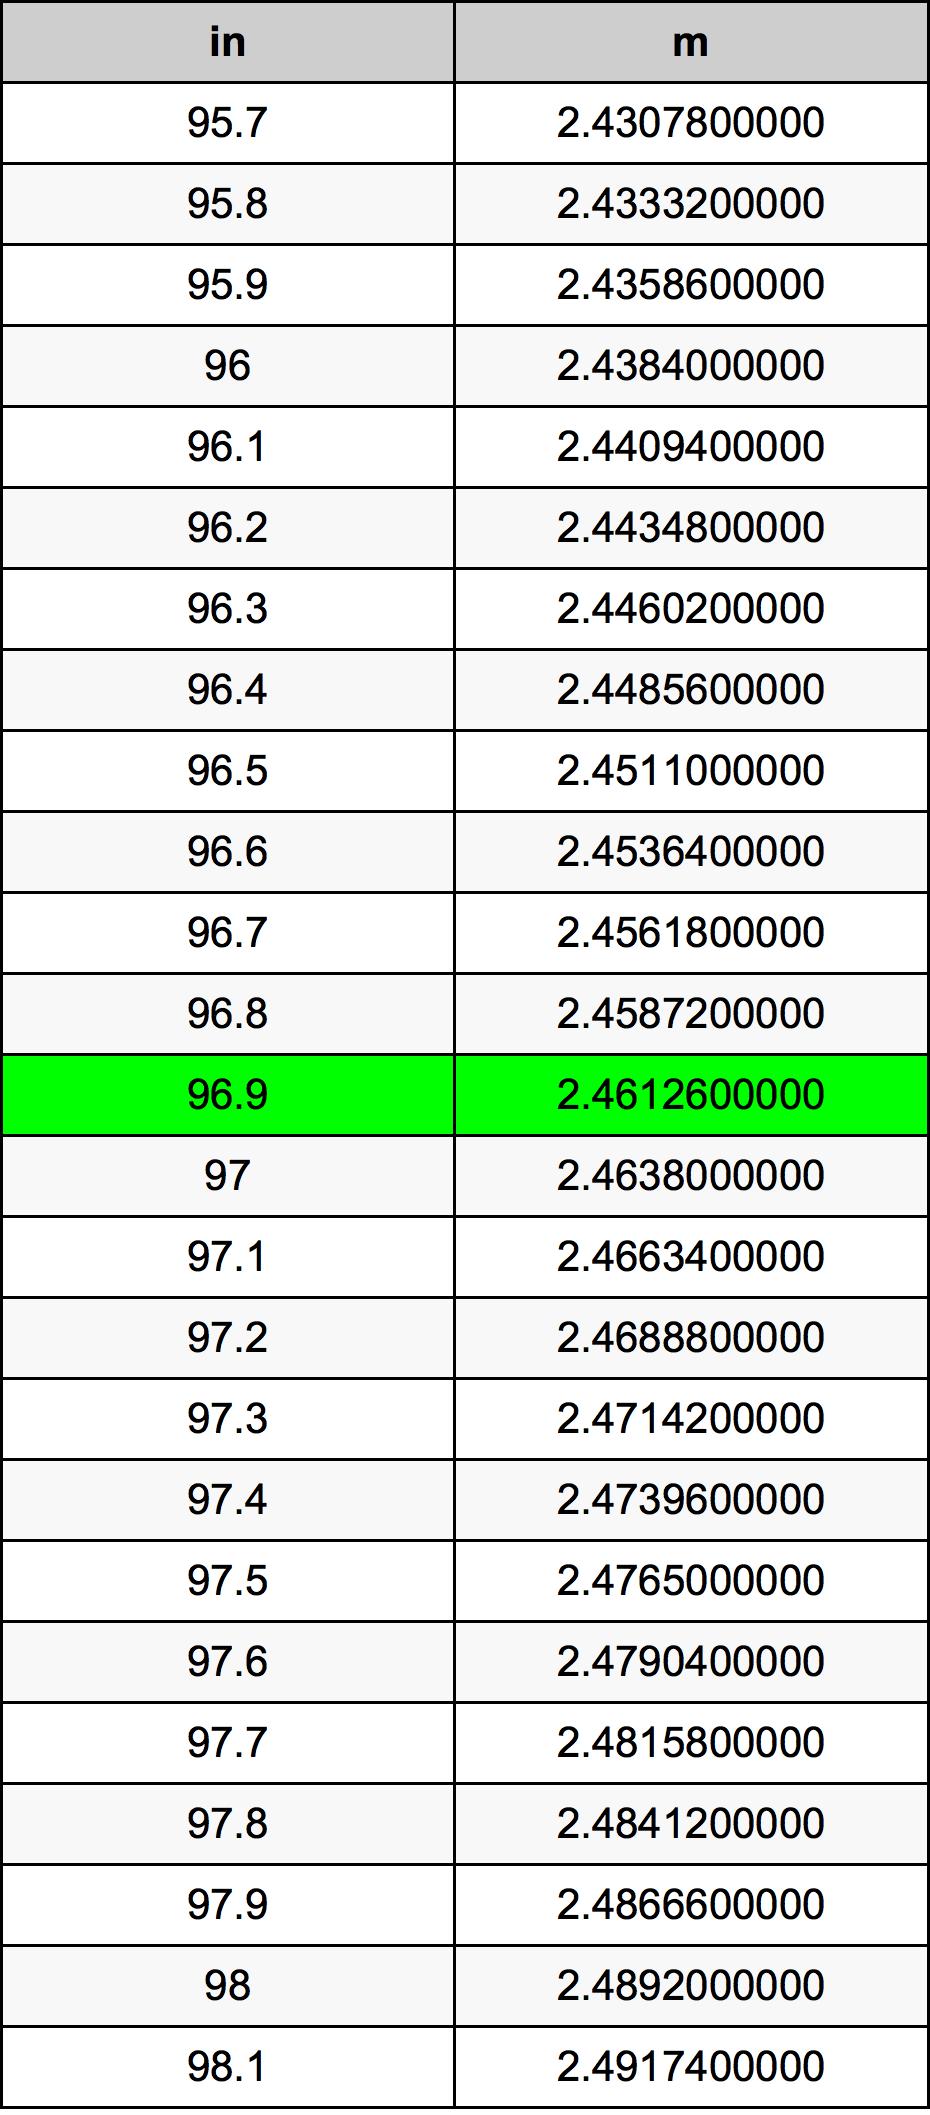 96.9 дюйм Таблица преобразования